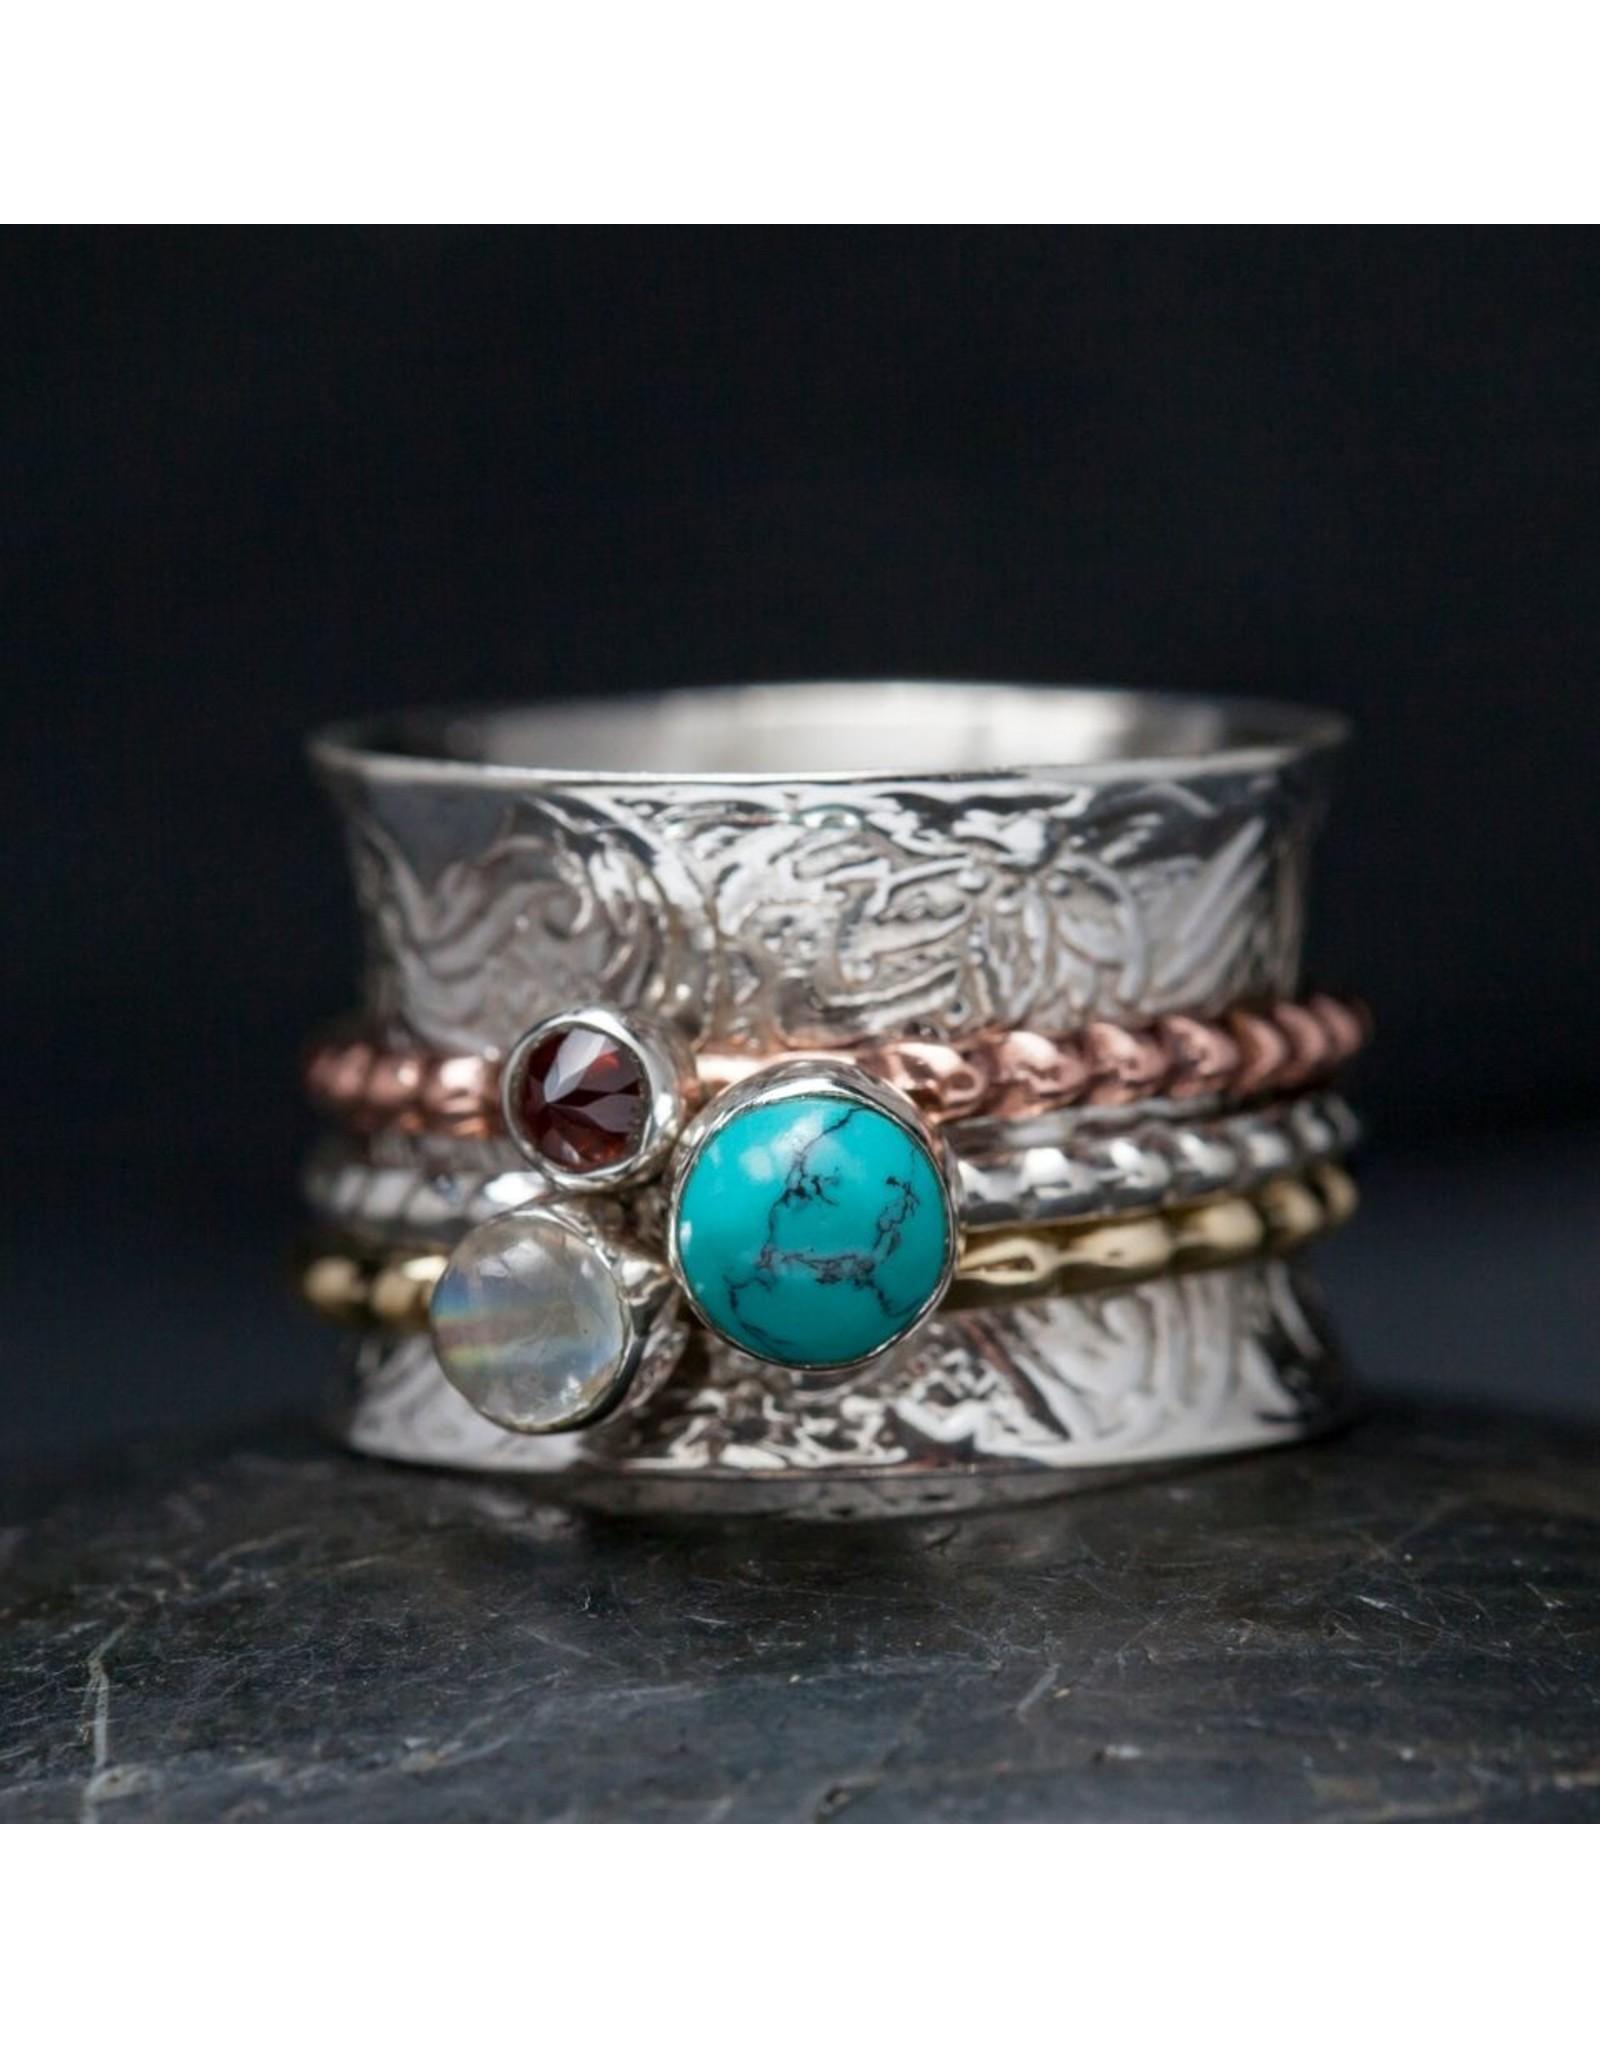 Turquoise, Garnet & Moonstone Sterling Spin Ring